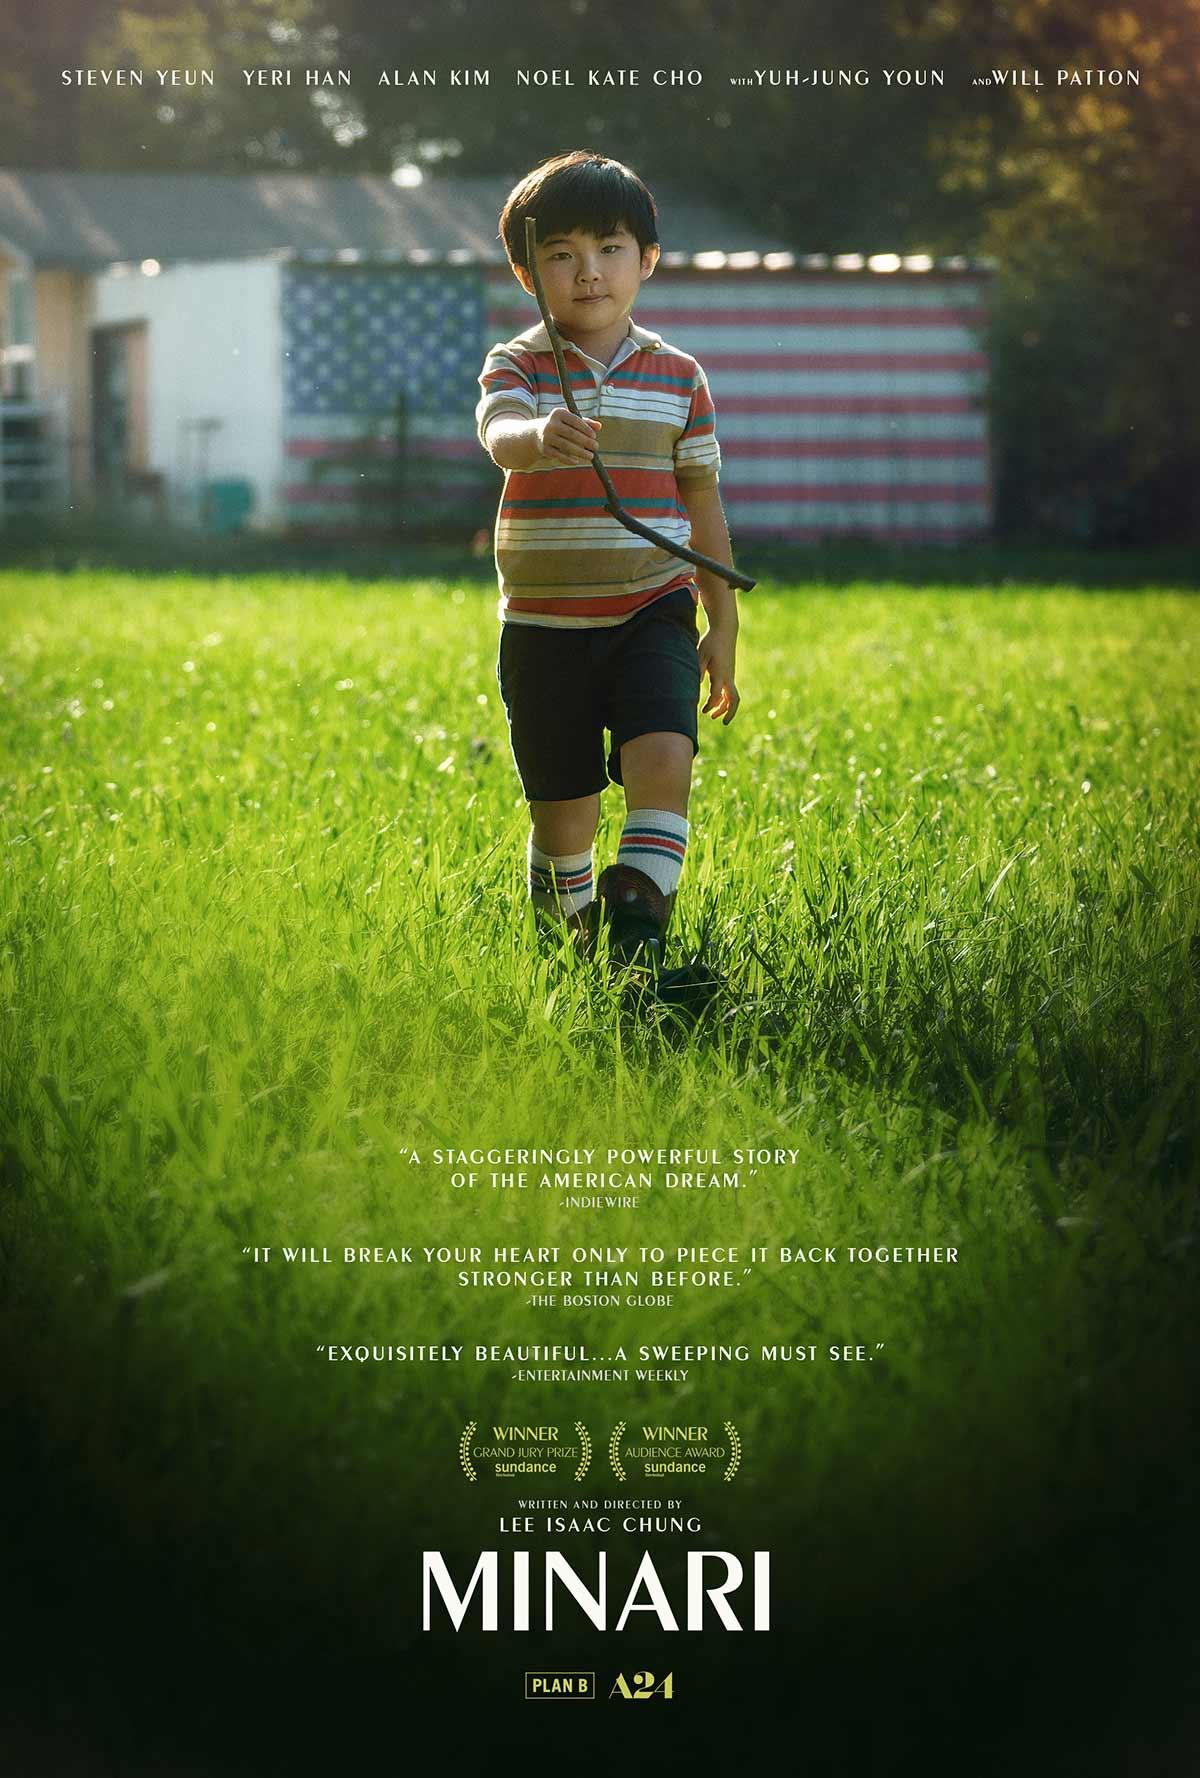 Movie poster for the film Minari starring Steven Yeun